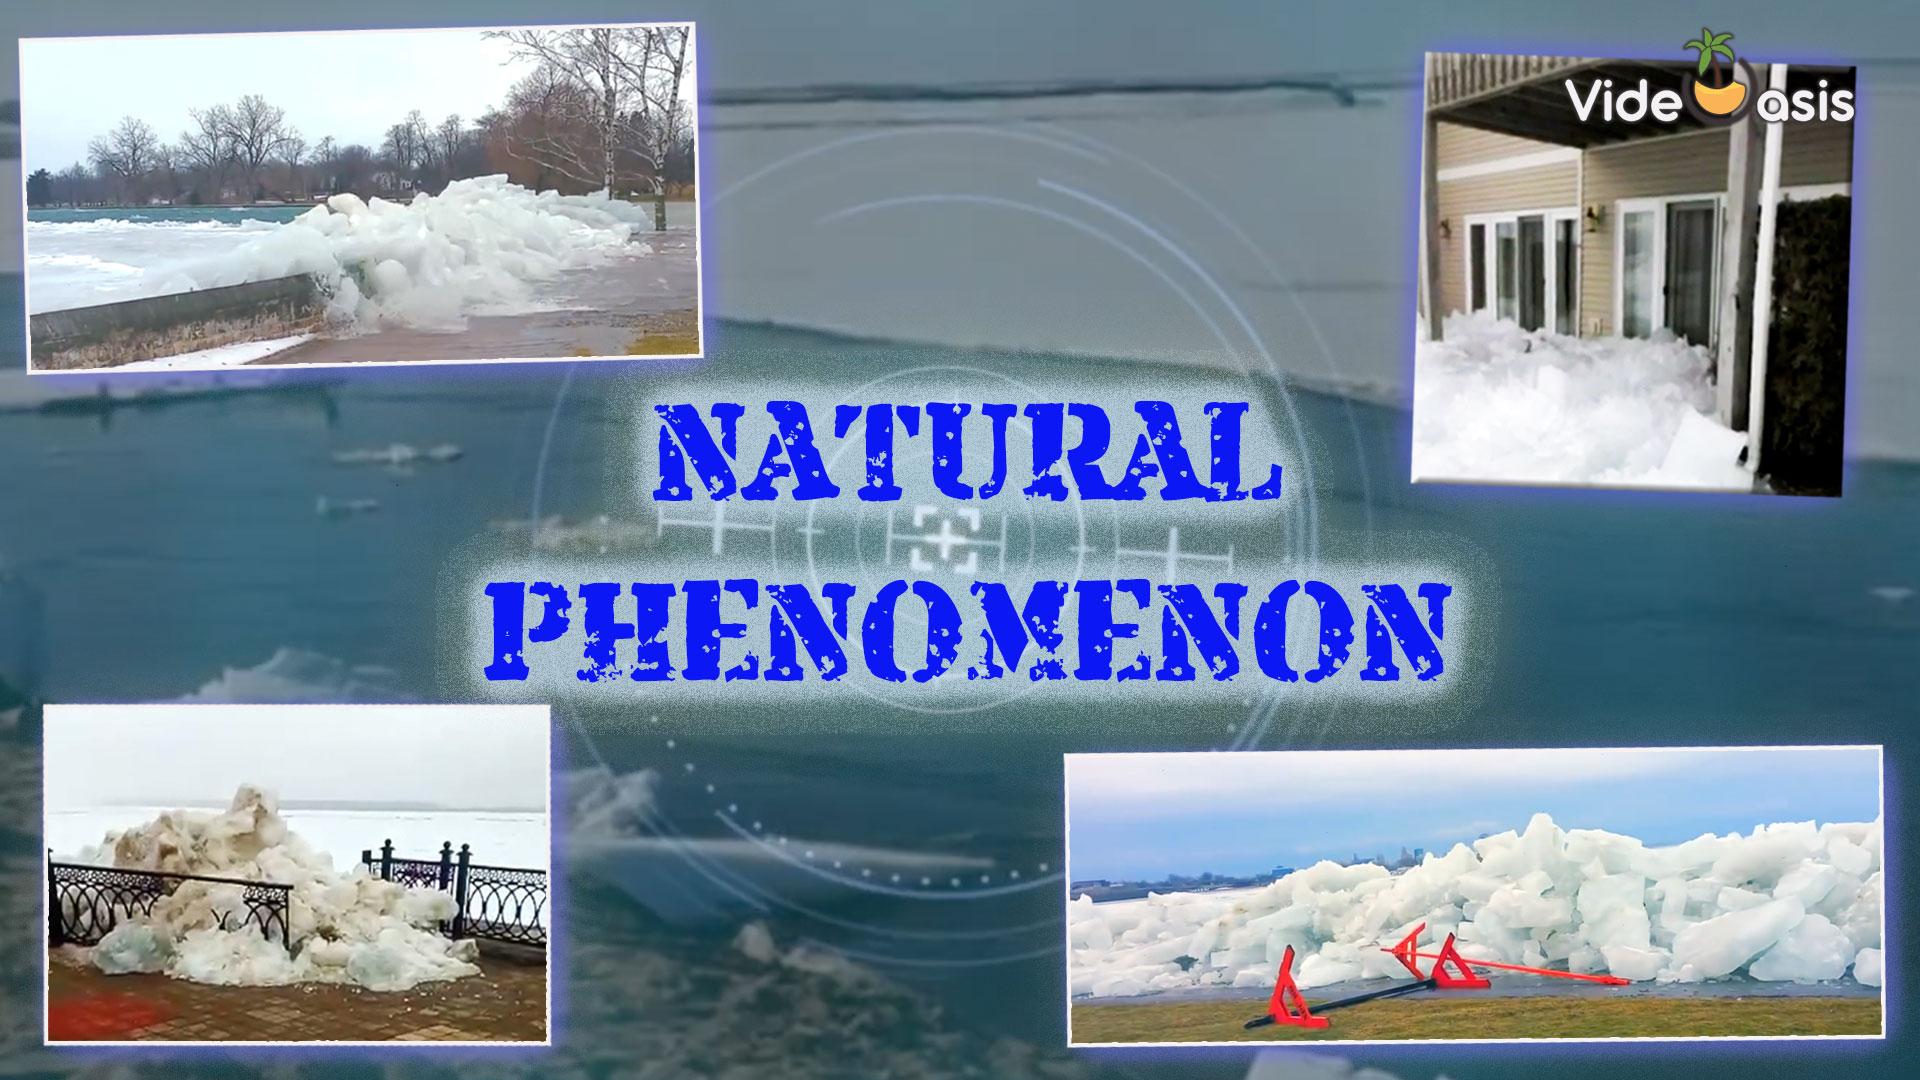 The Spectacular Phenomenon -- Ice Shove |VideOasis